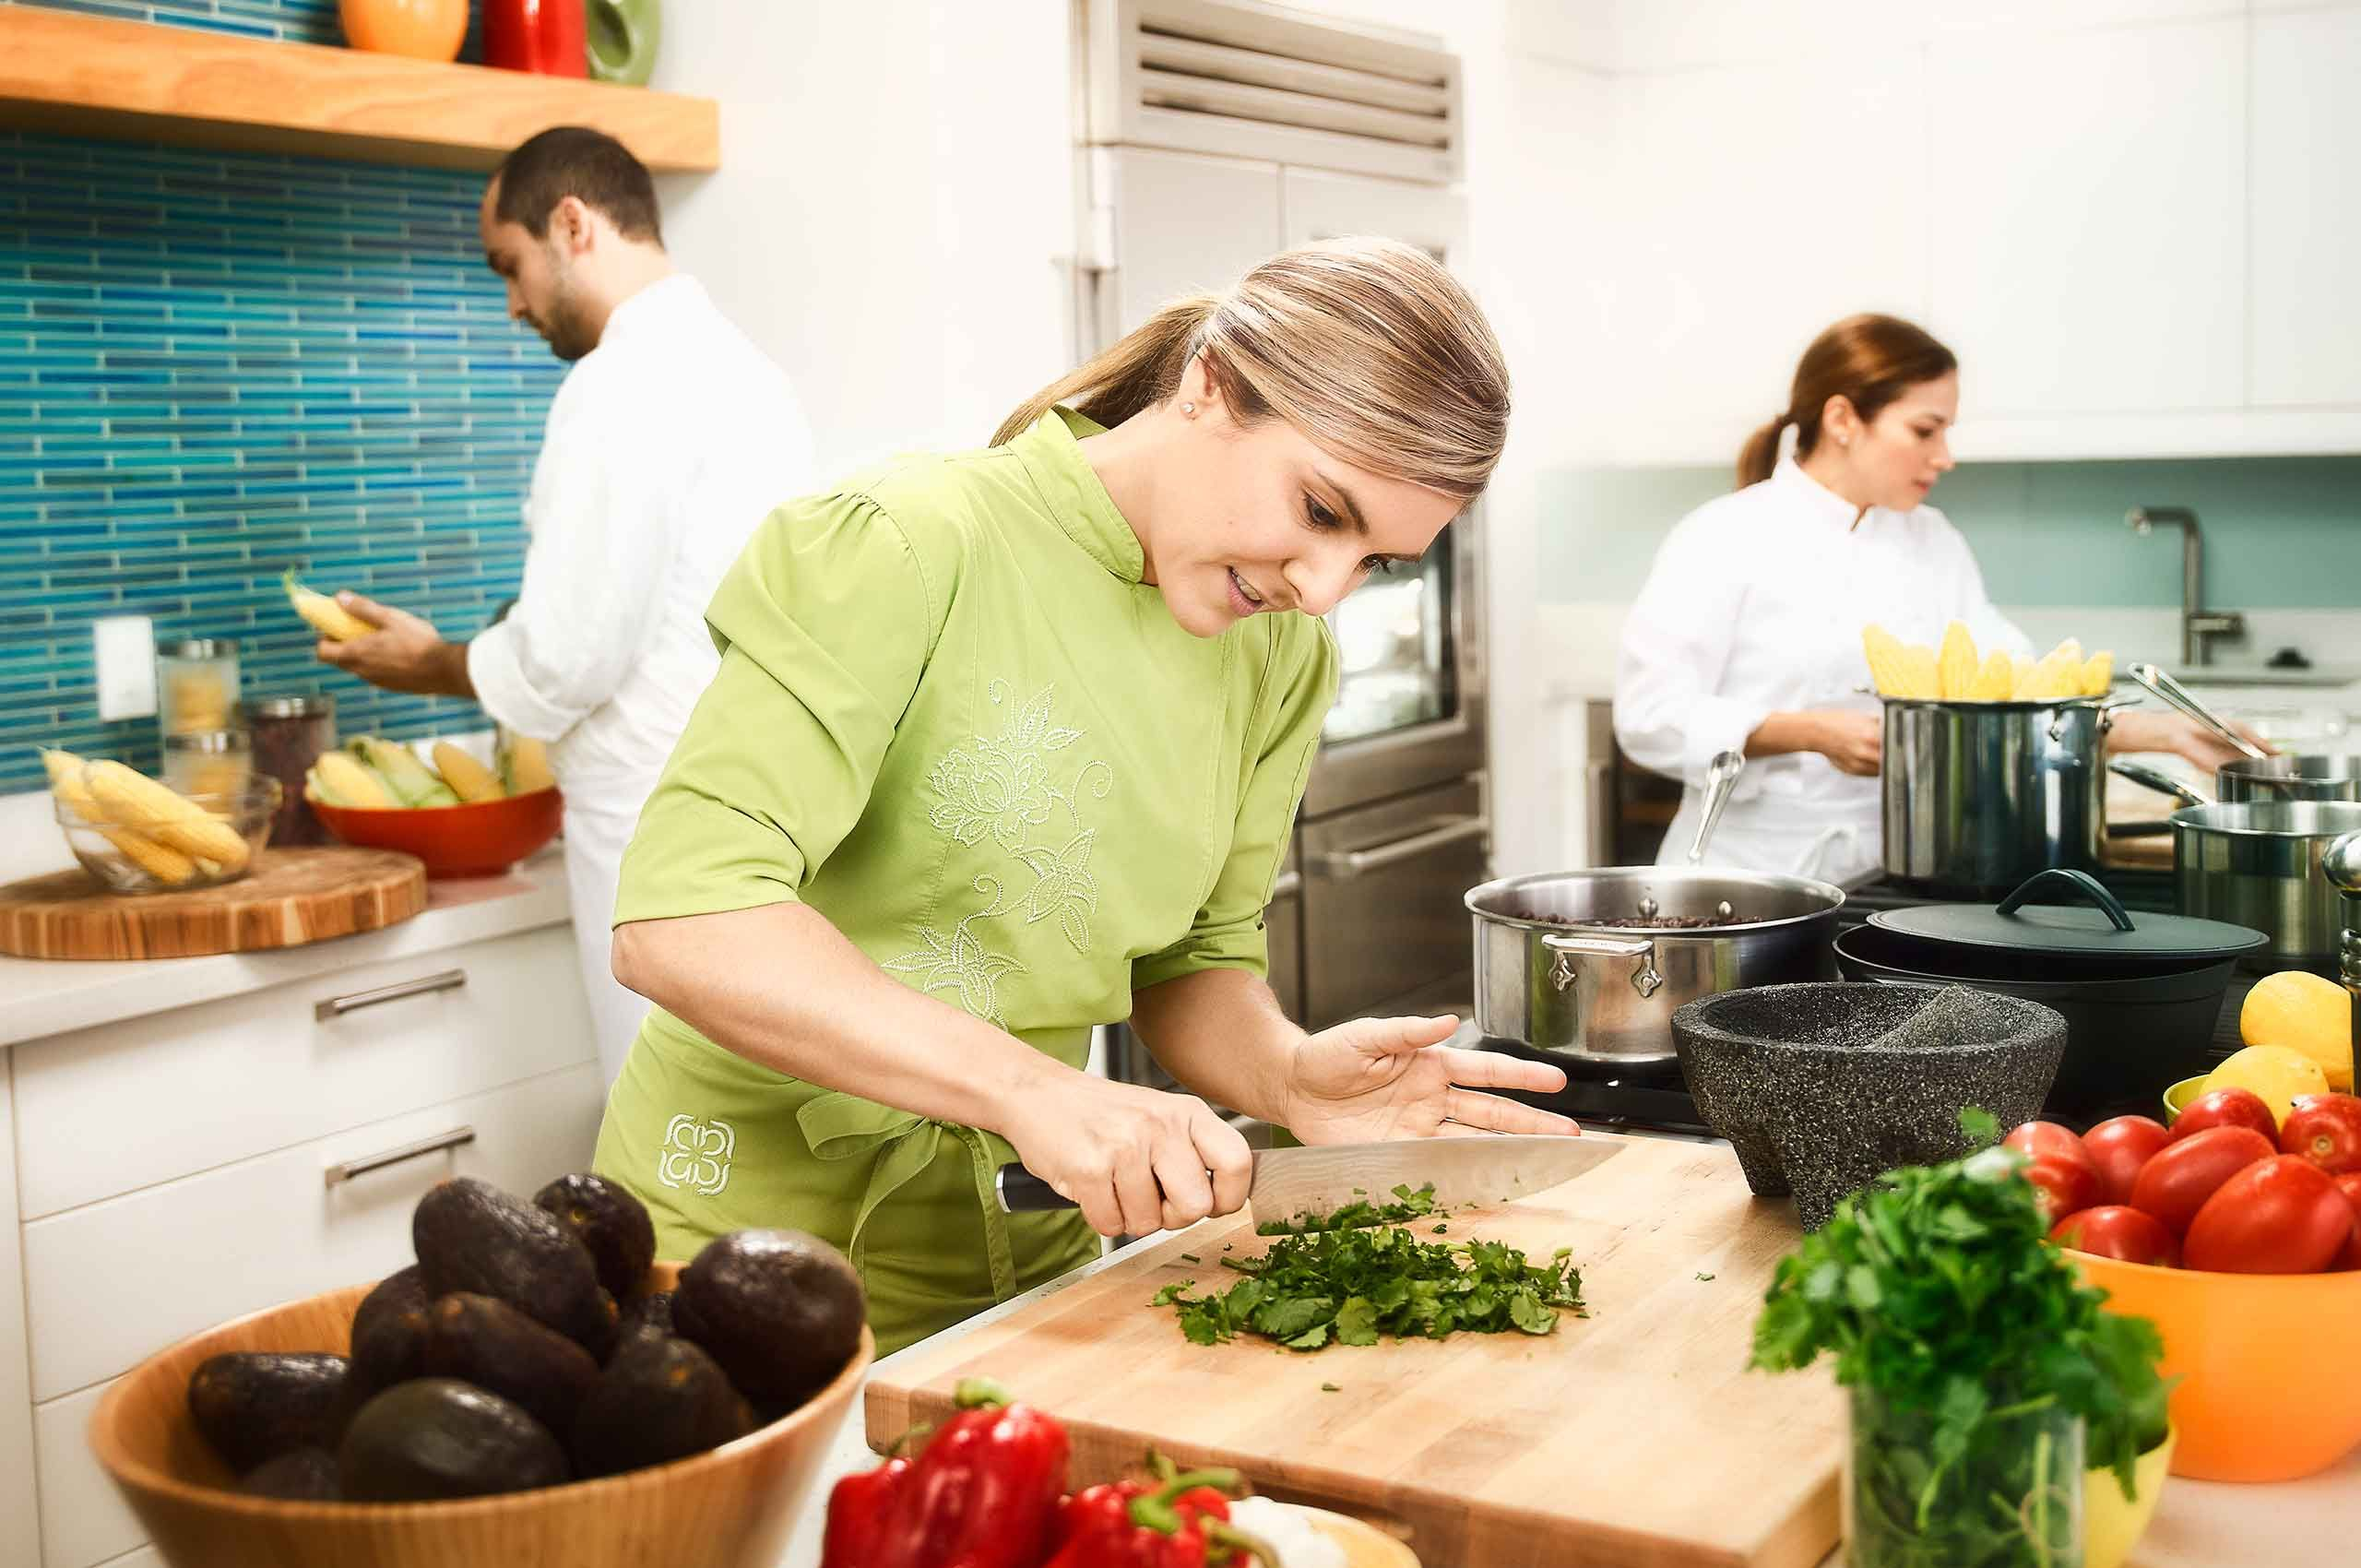 Chef-LorenaGarcia2-HenrikOlundPhotography.jpg